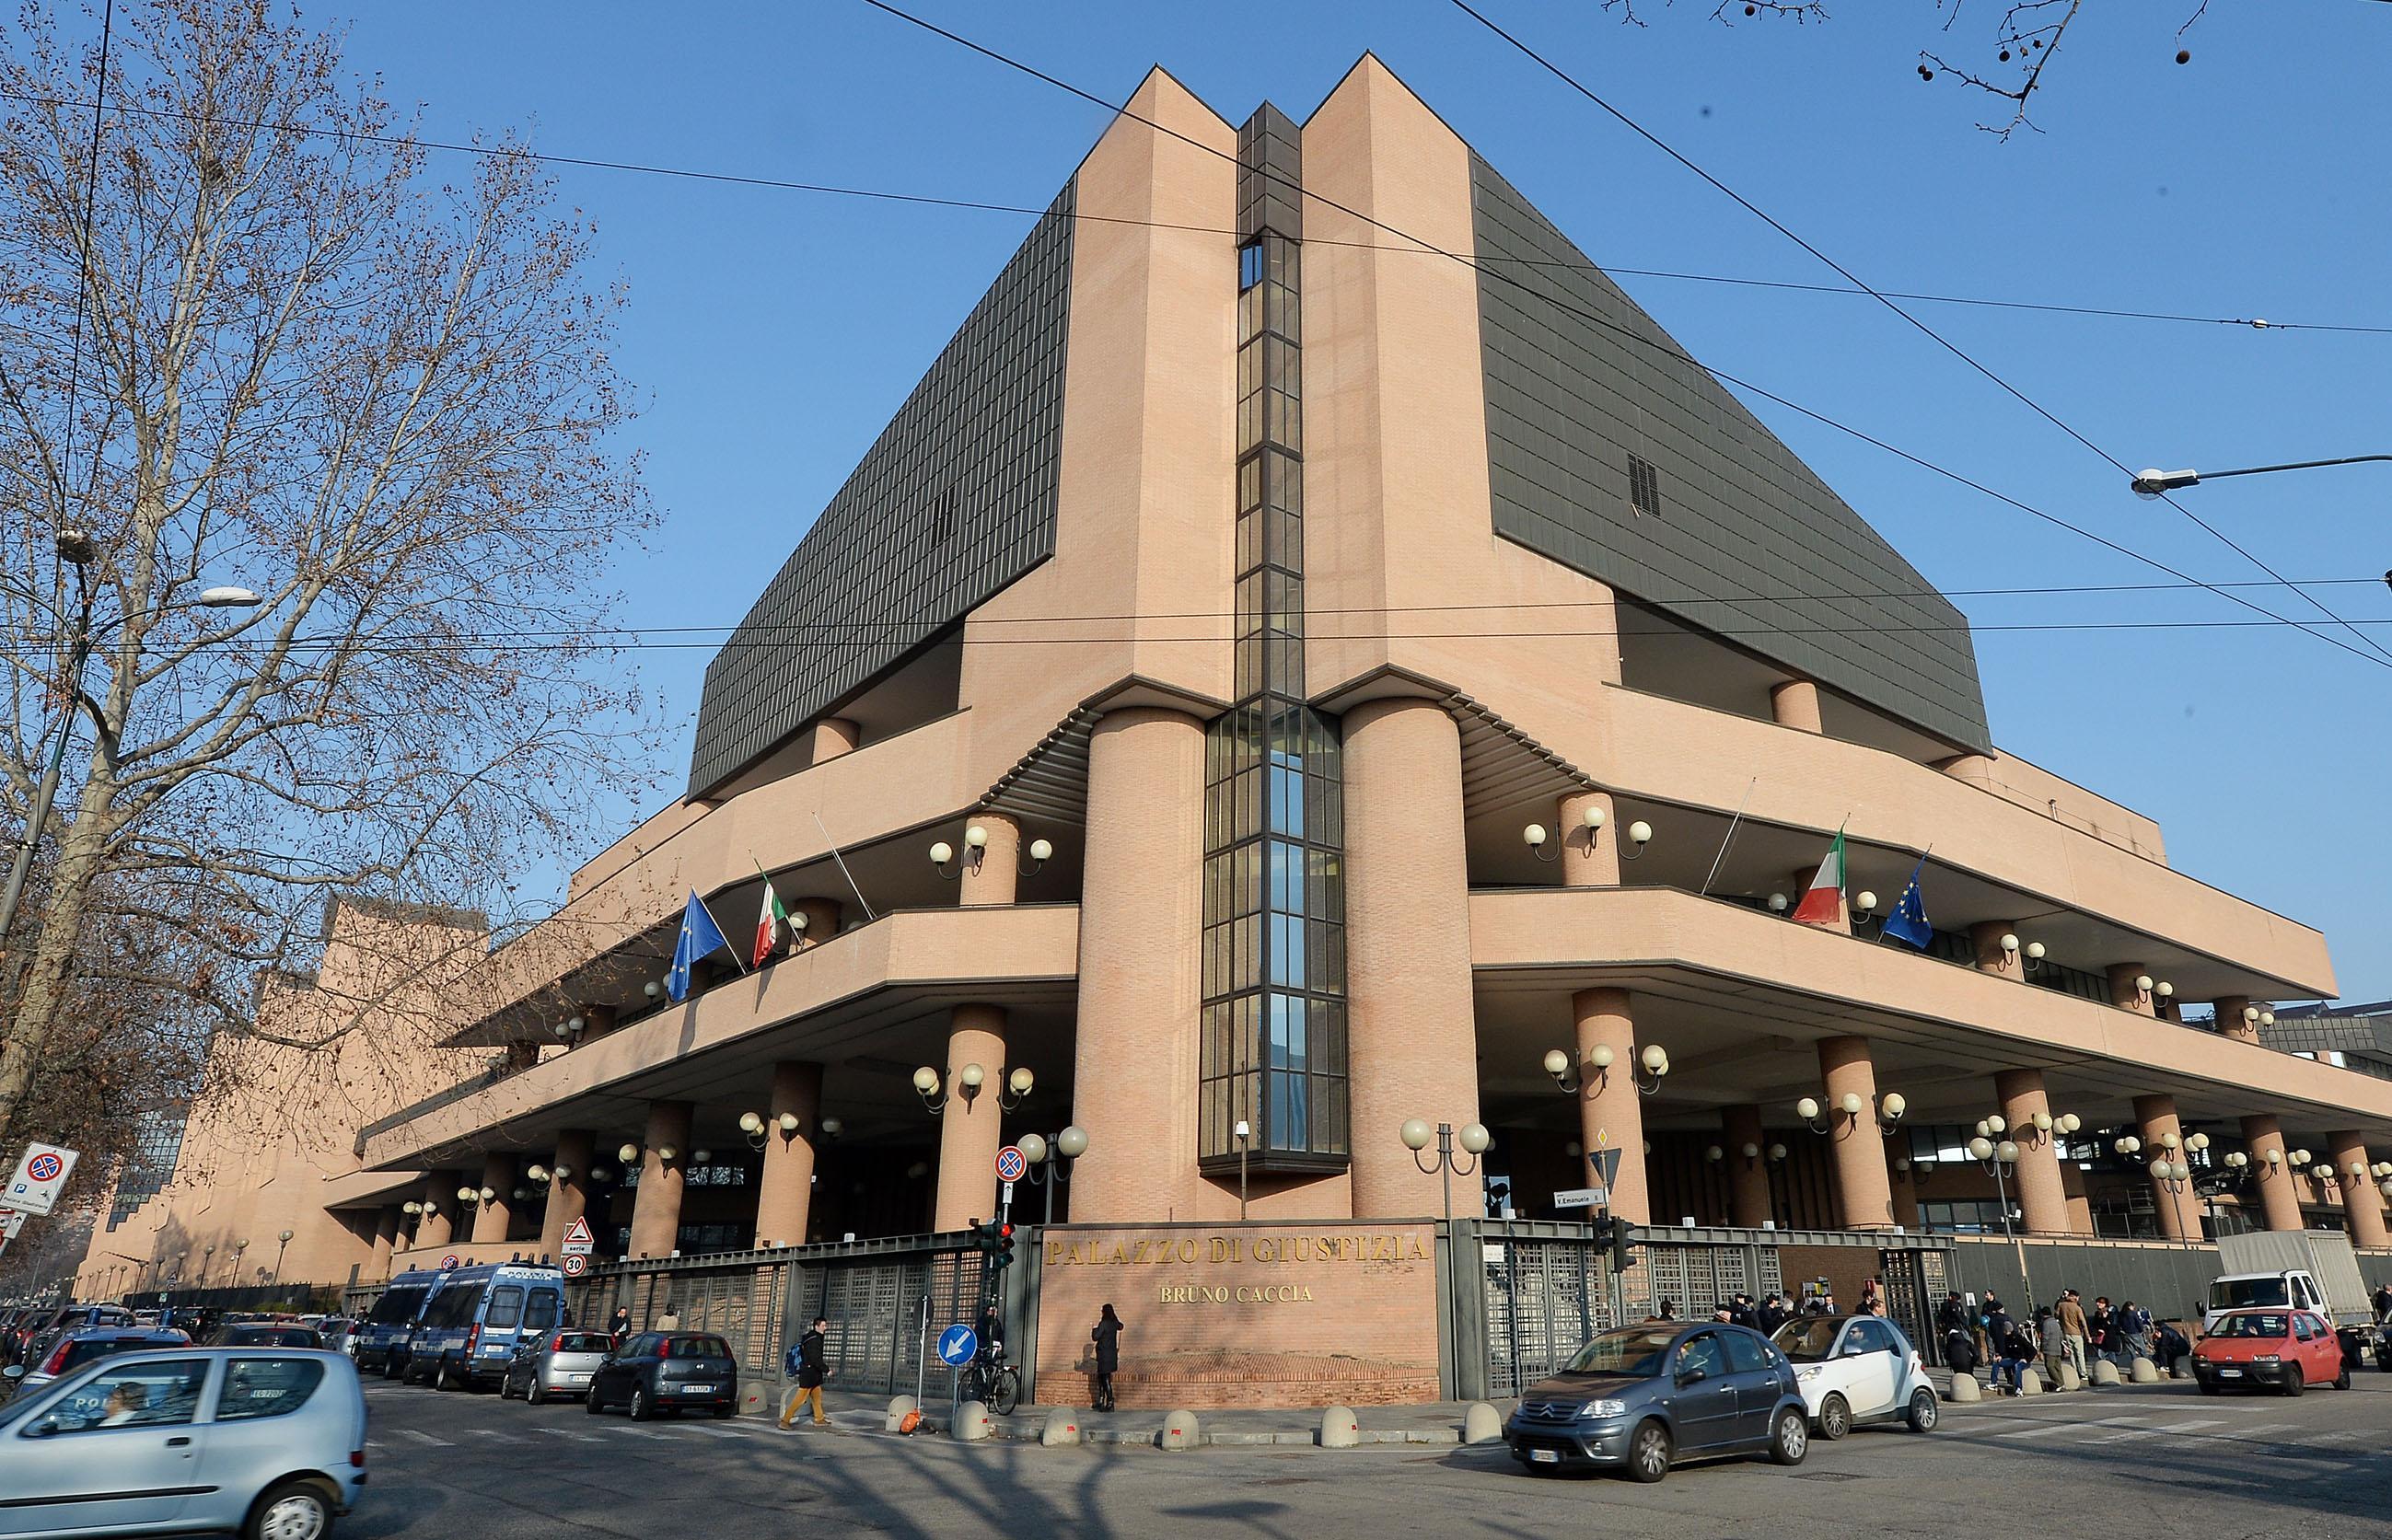 Isis,5 arresti 'non eseguibili' a Torino